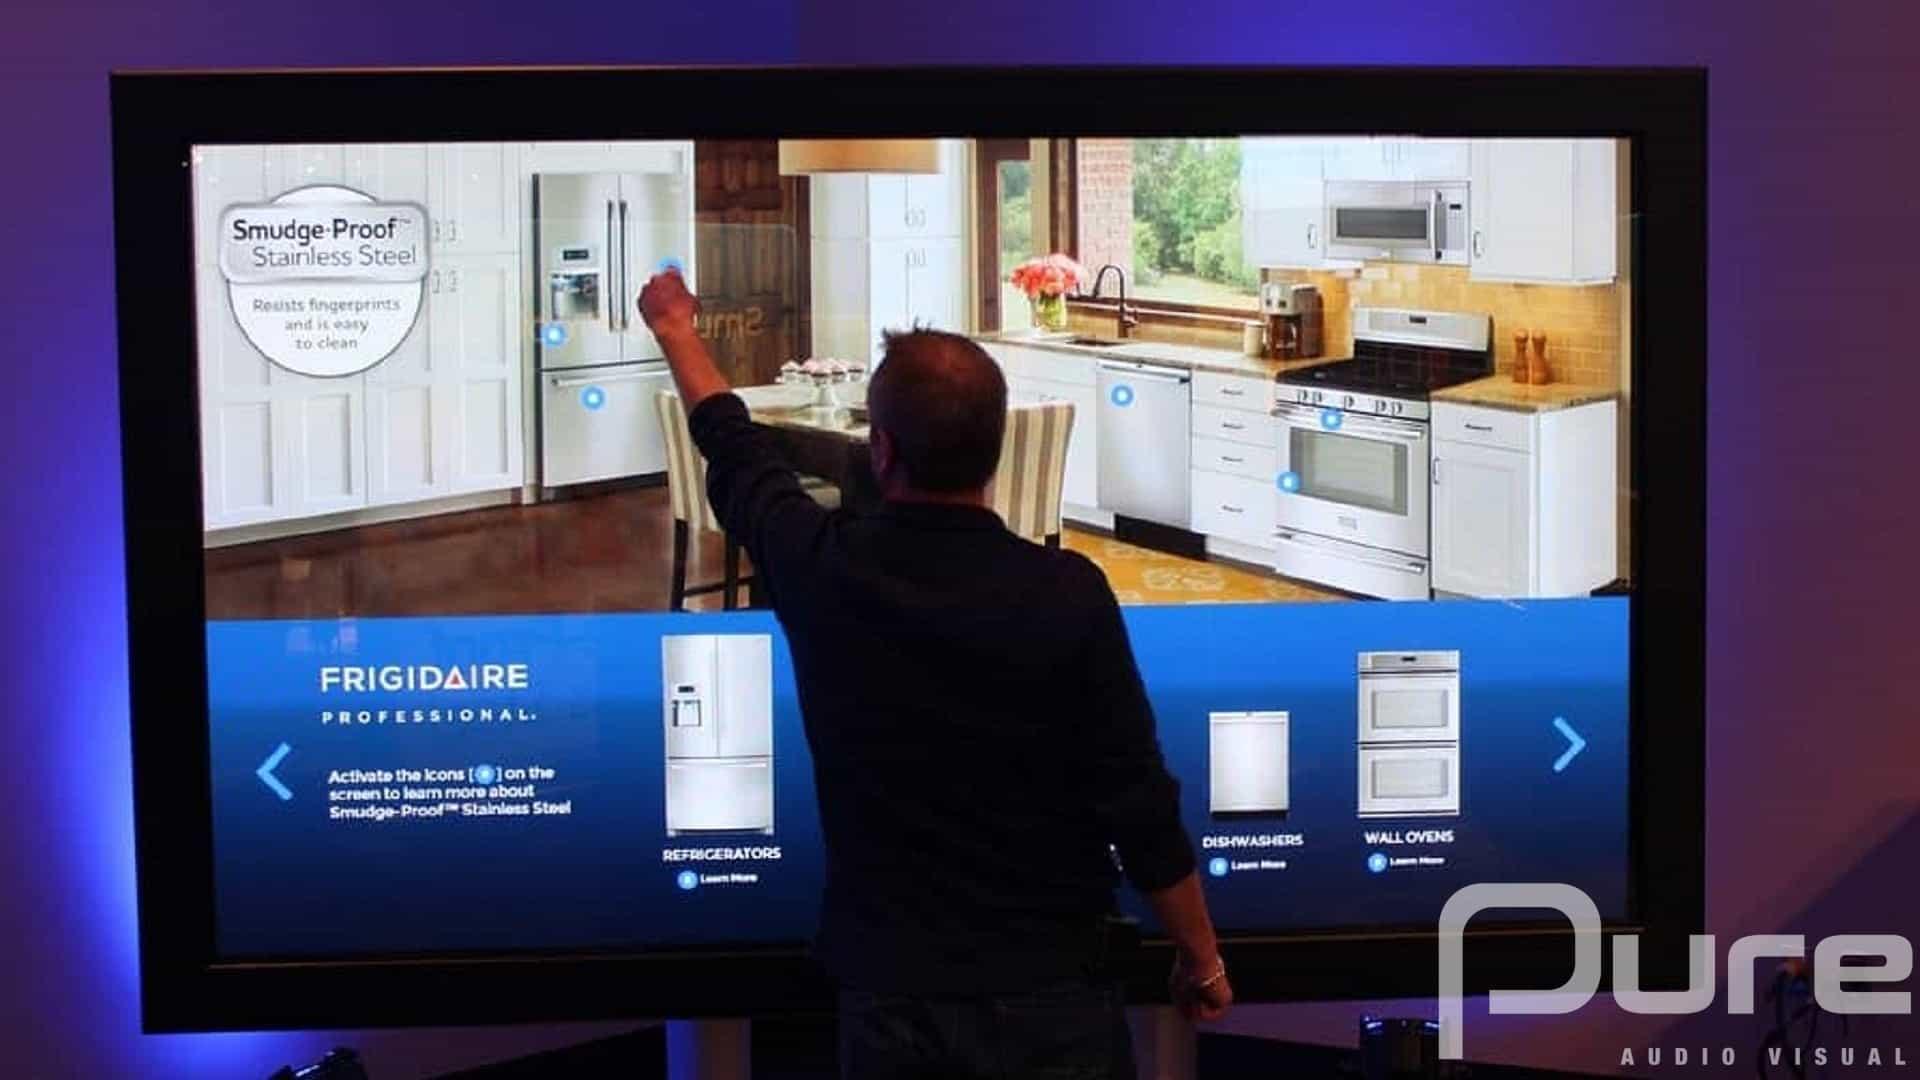 touchscreen TV rental company